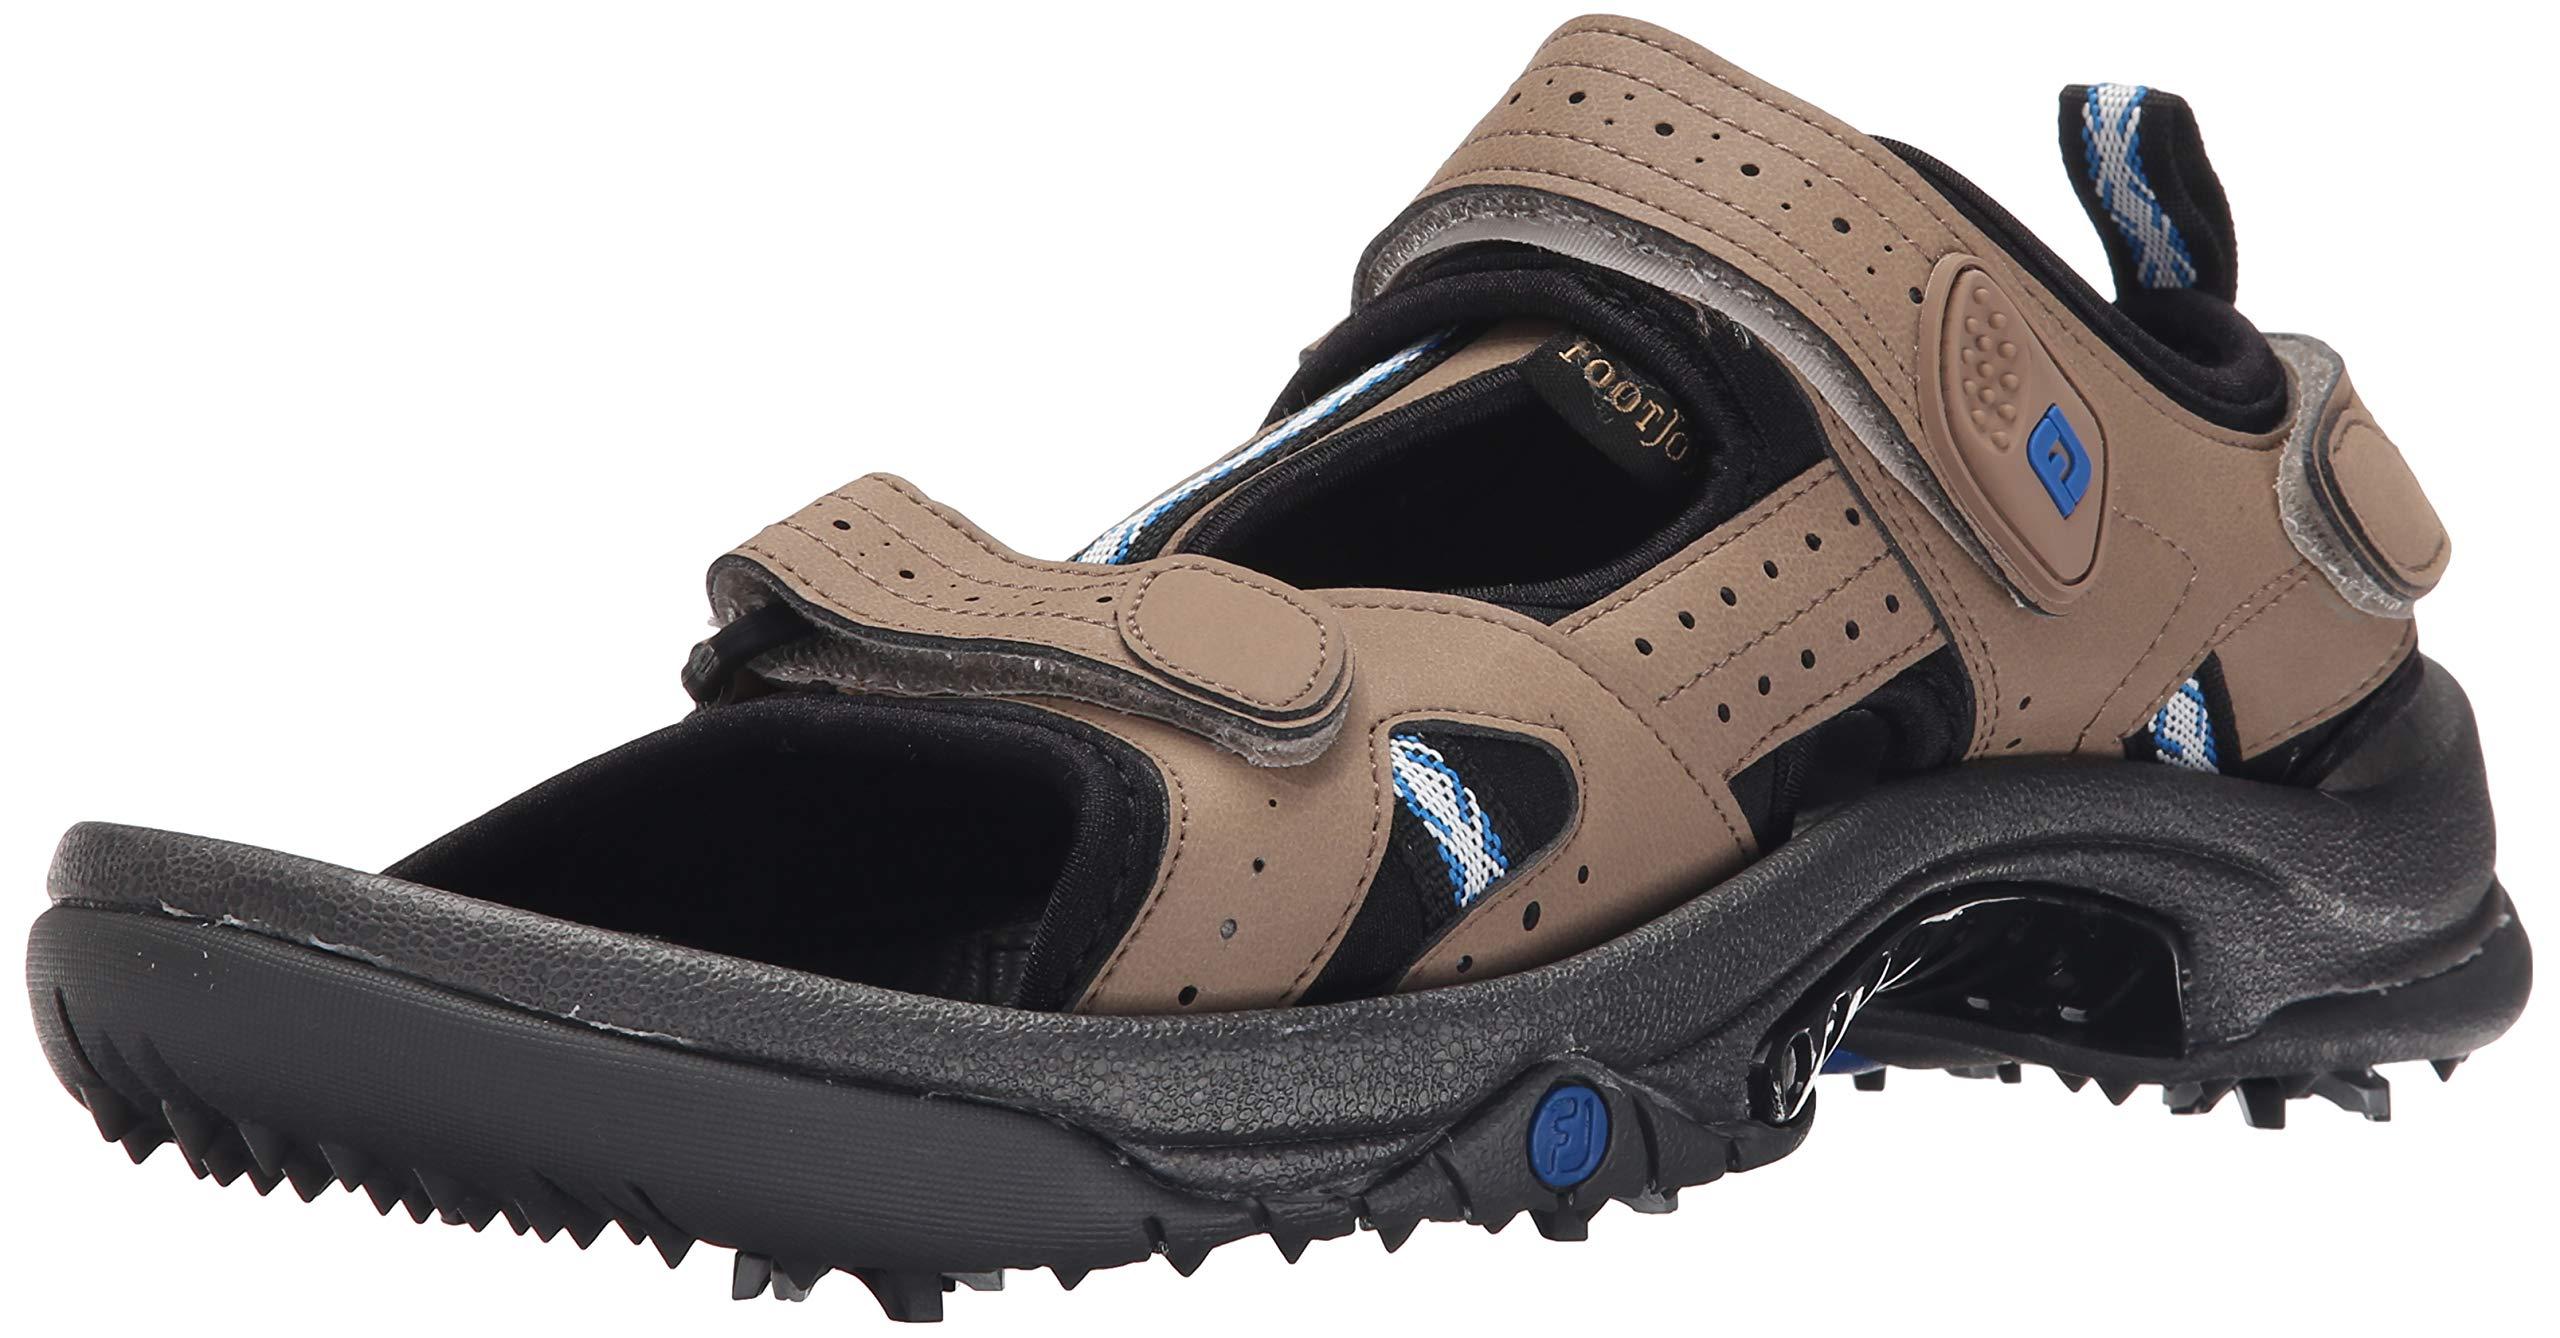 FootJoy Men's Golf Sandals Beige 13 M Shoe, Dark Taupe, US